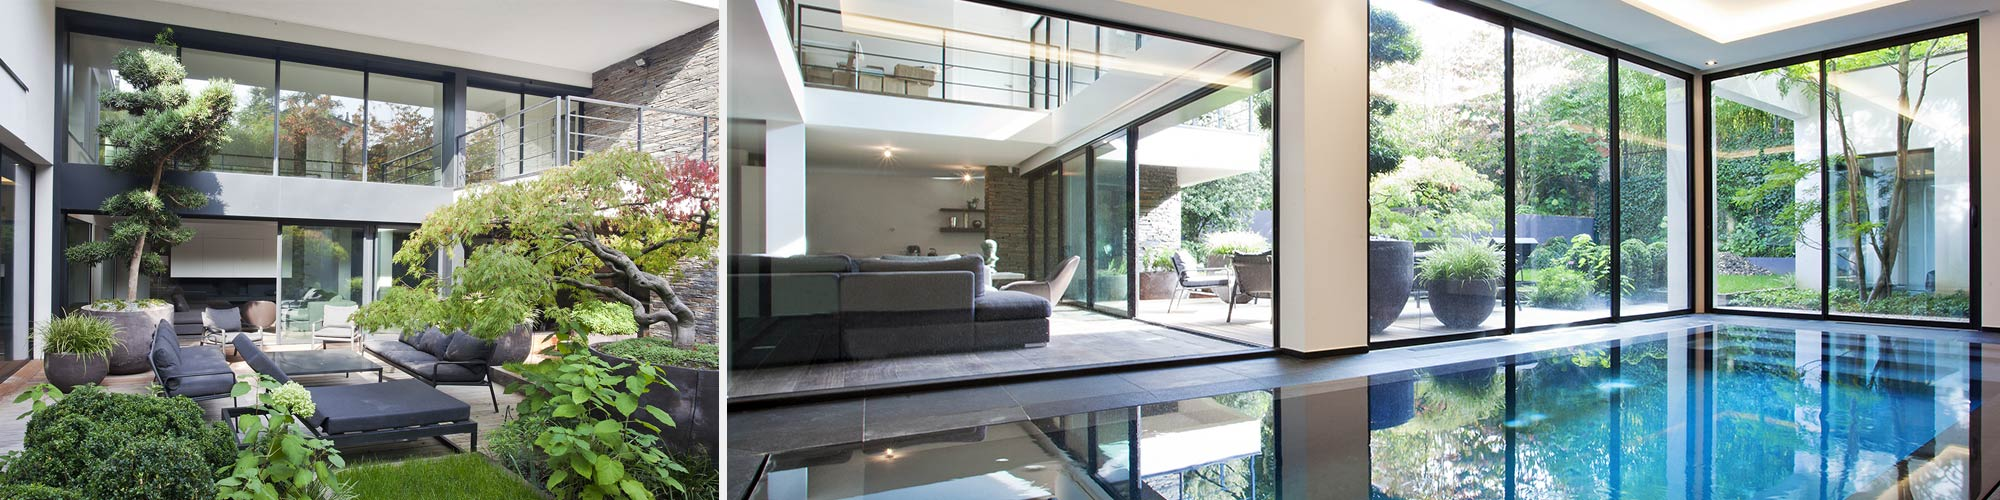 architectes maison. Black Bedroom Furniture Sets. Home Design Ideas